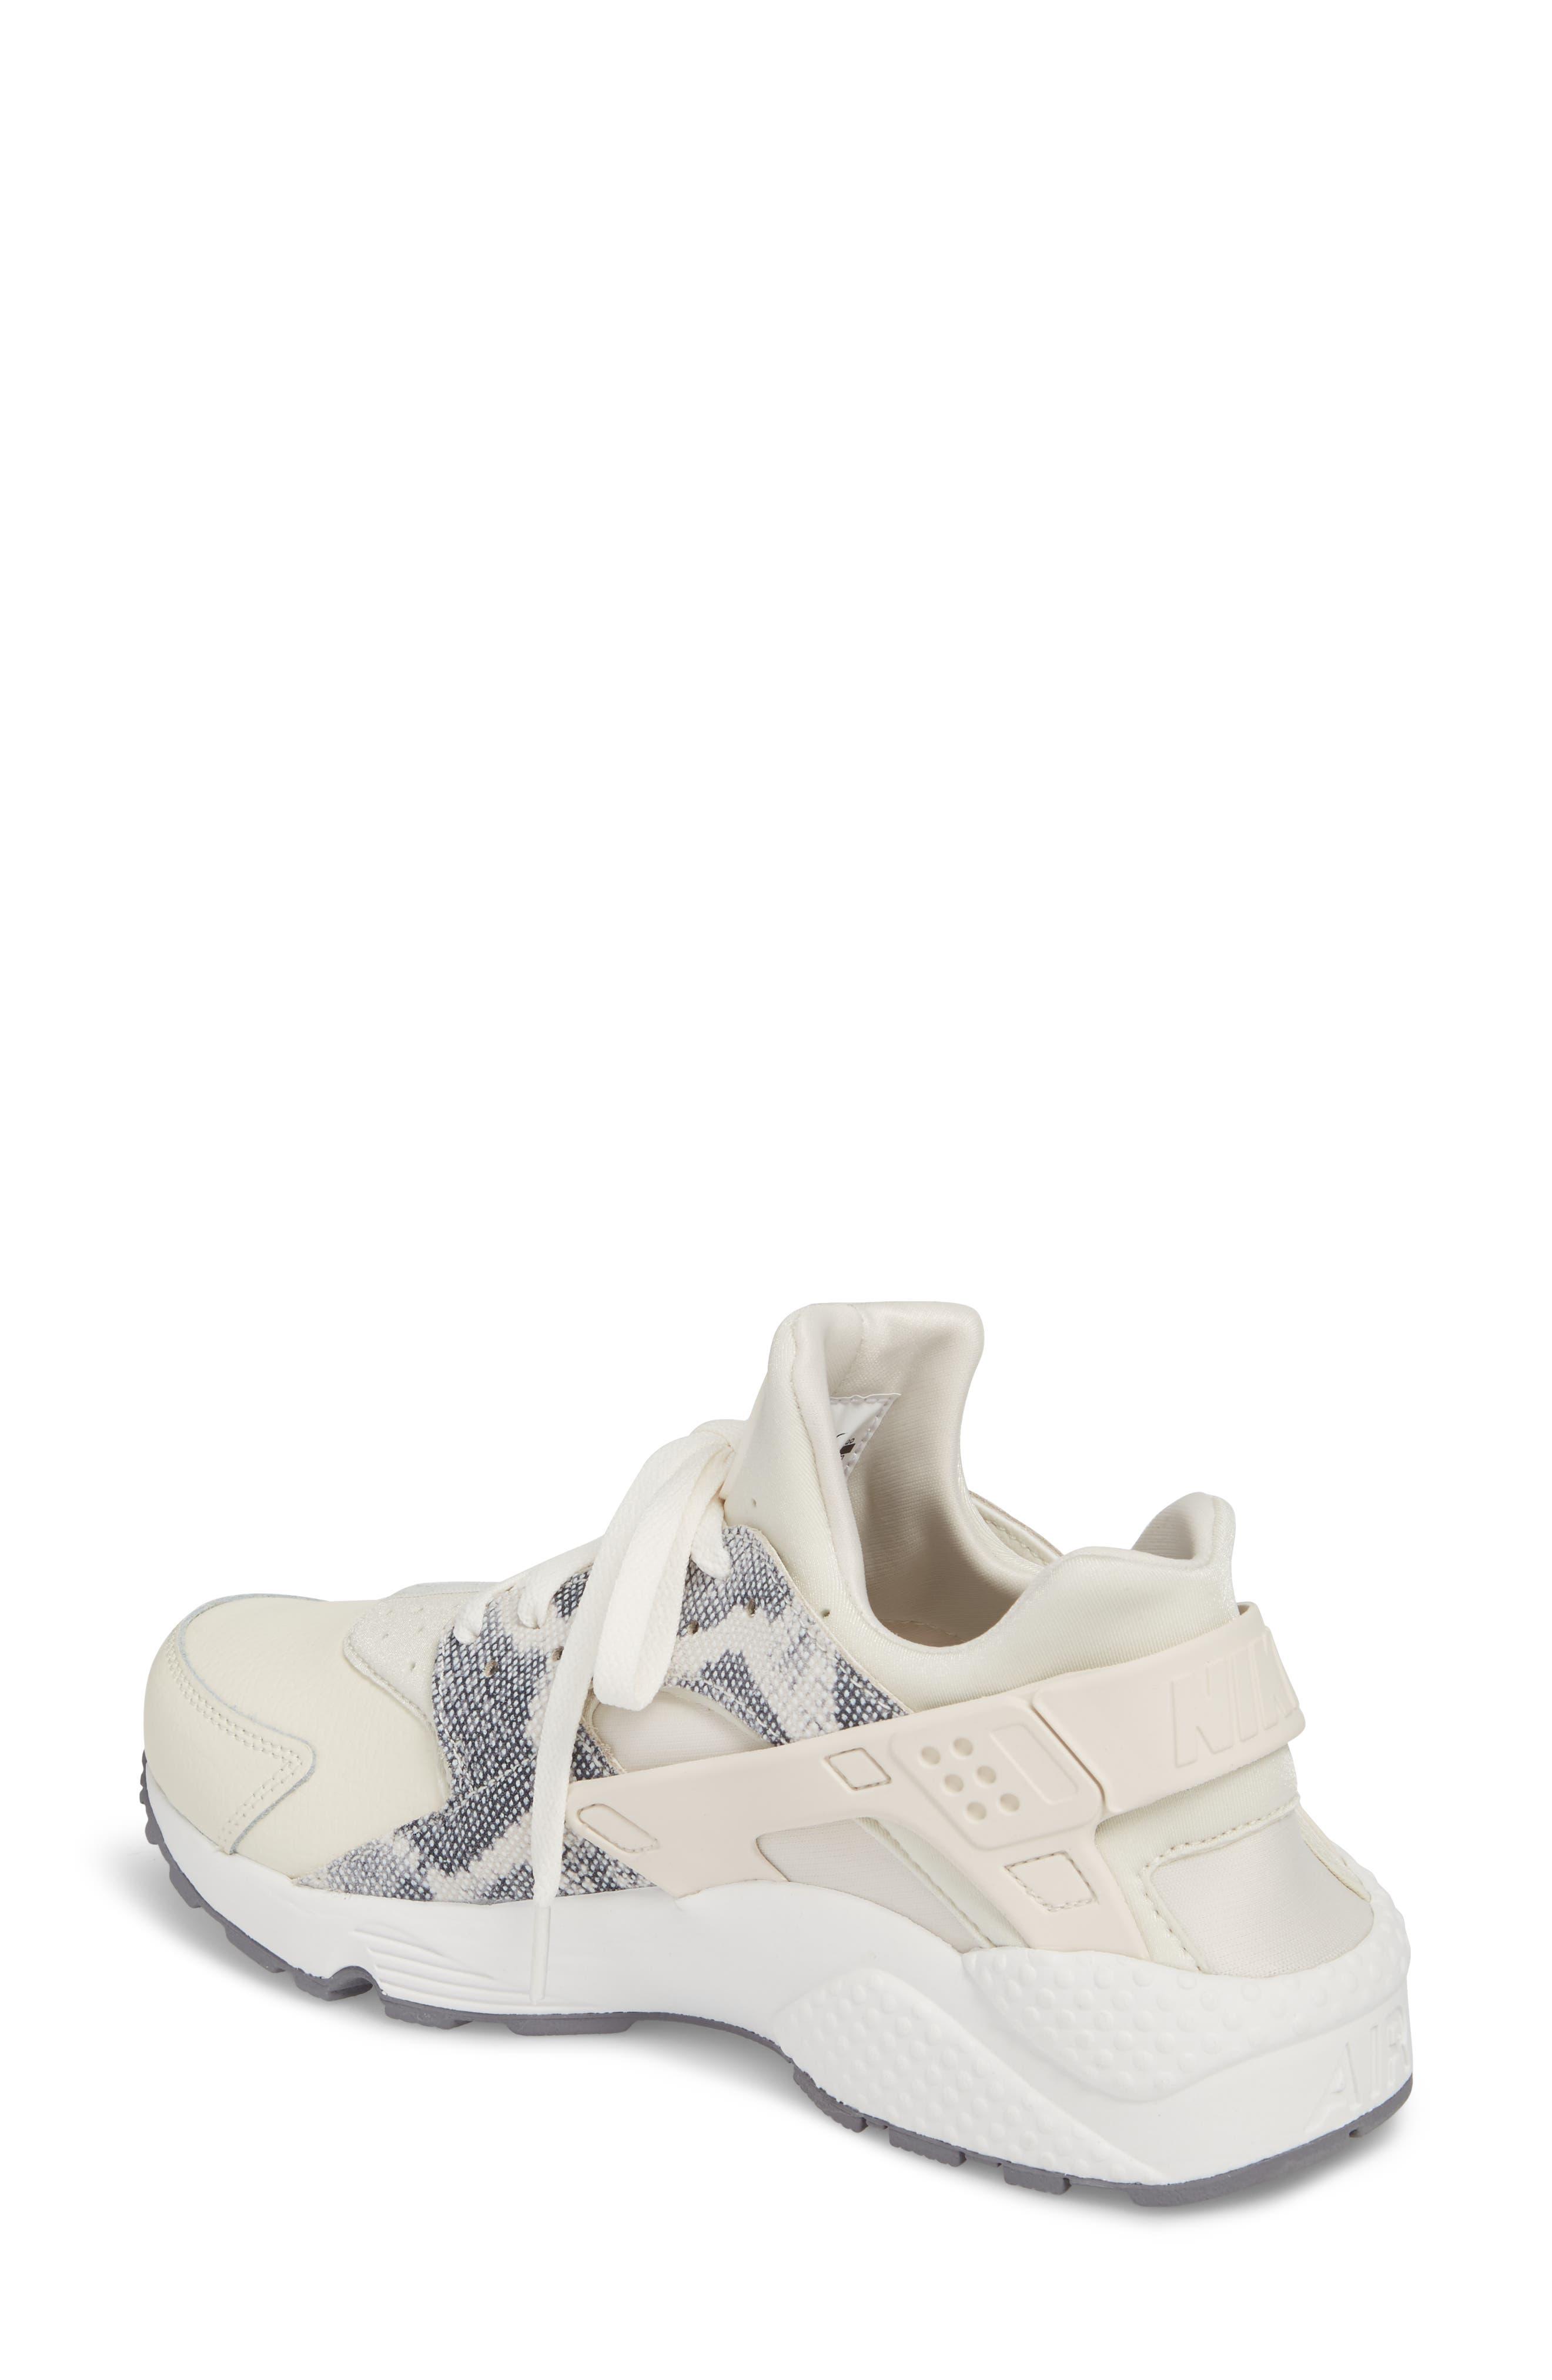 'Air Huarache' Sneaker,                             Alternate thumbnail 2, color,                             255